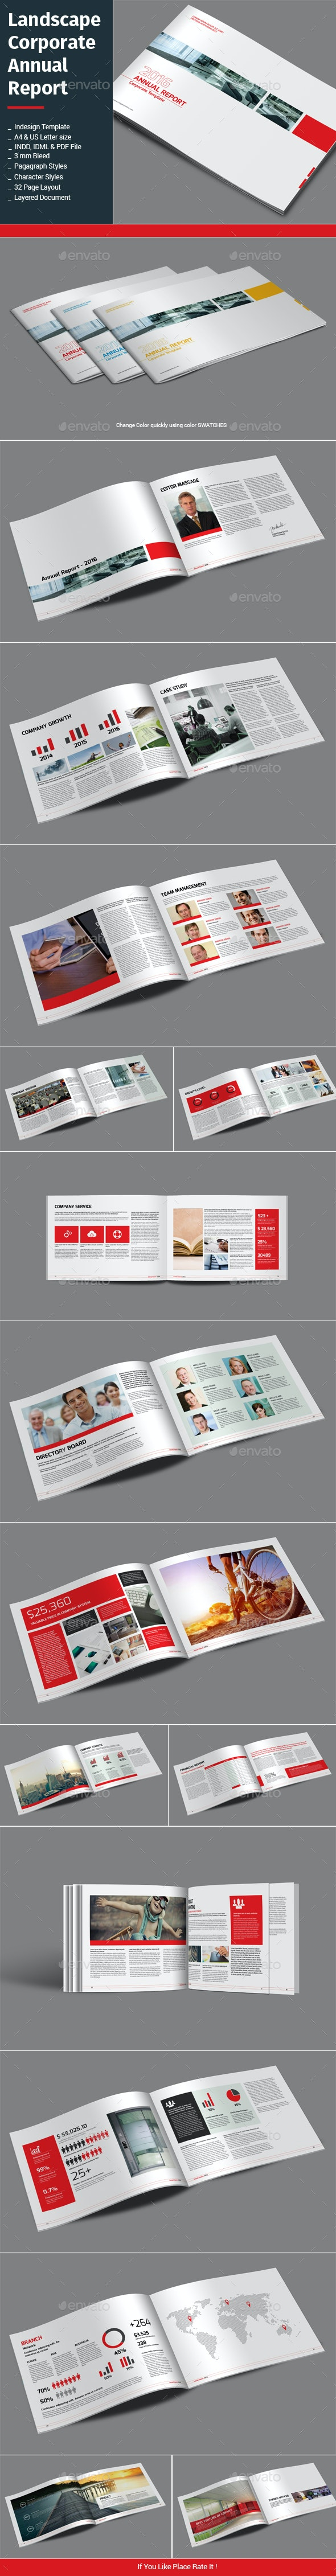 Landscape Corporate Annual Report - Informational Brochures